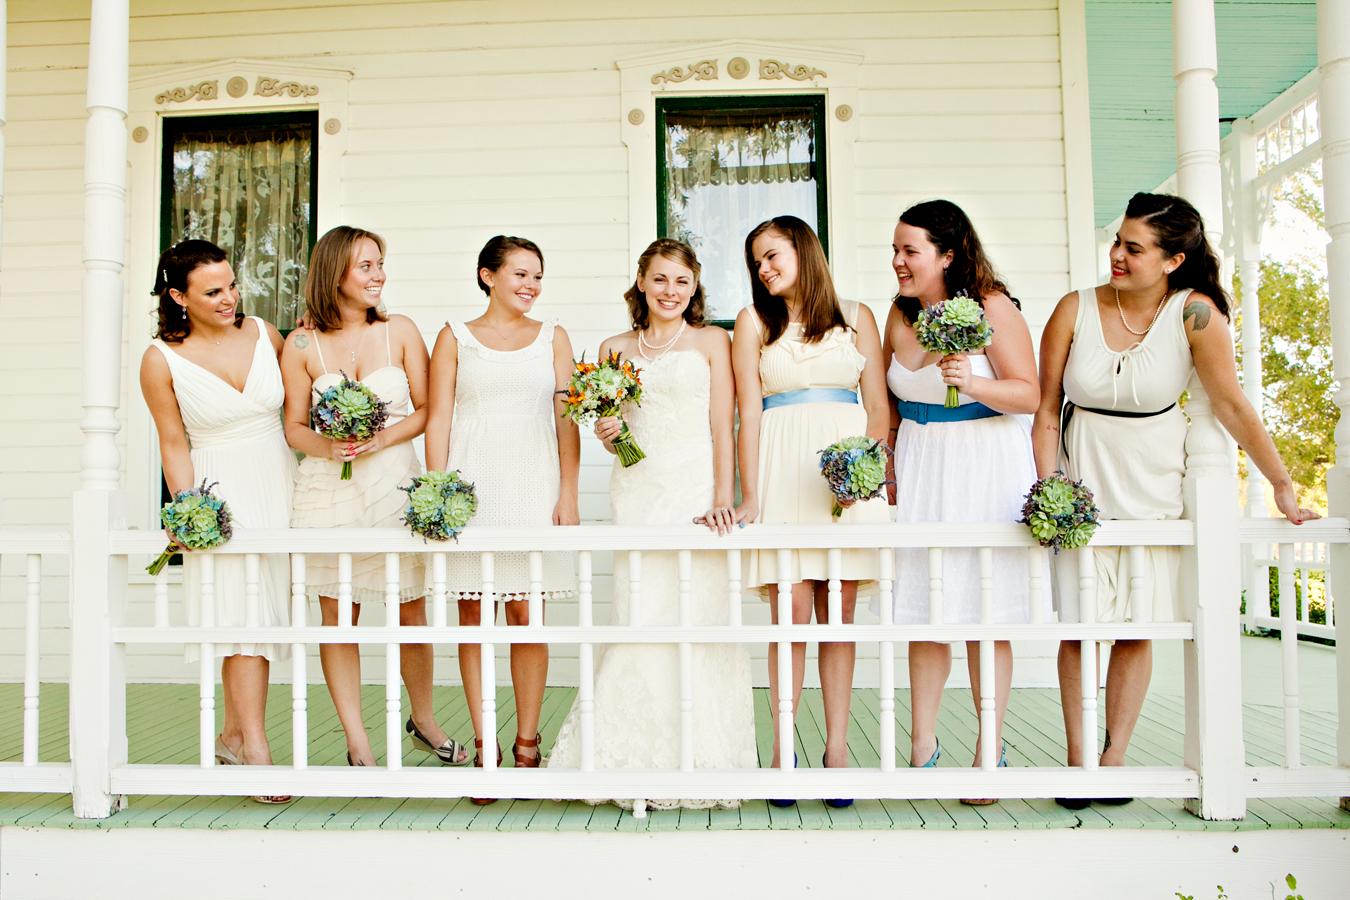 Katie rice wedding